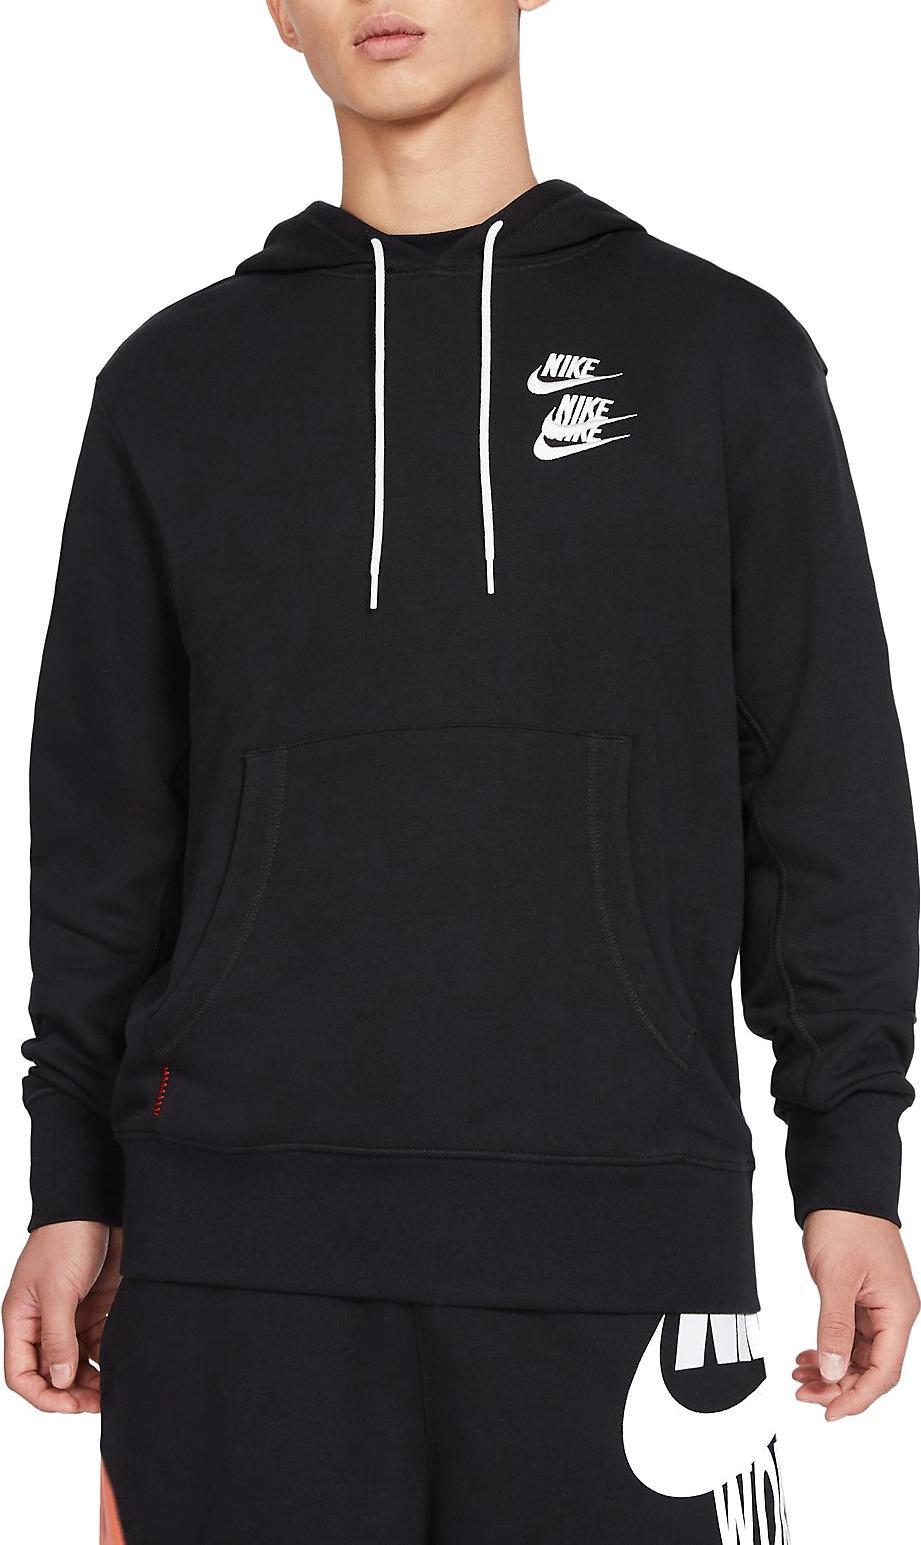 Mikina s kapucí Nike M NSW PO FT HOODIE WTOUR